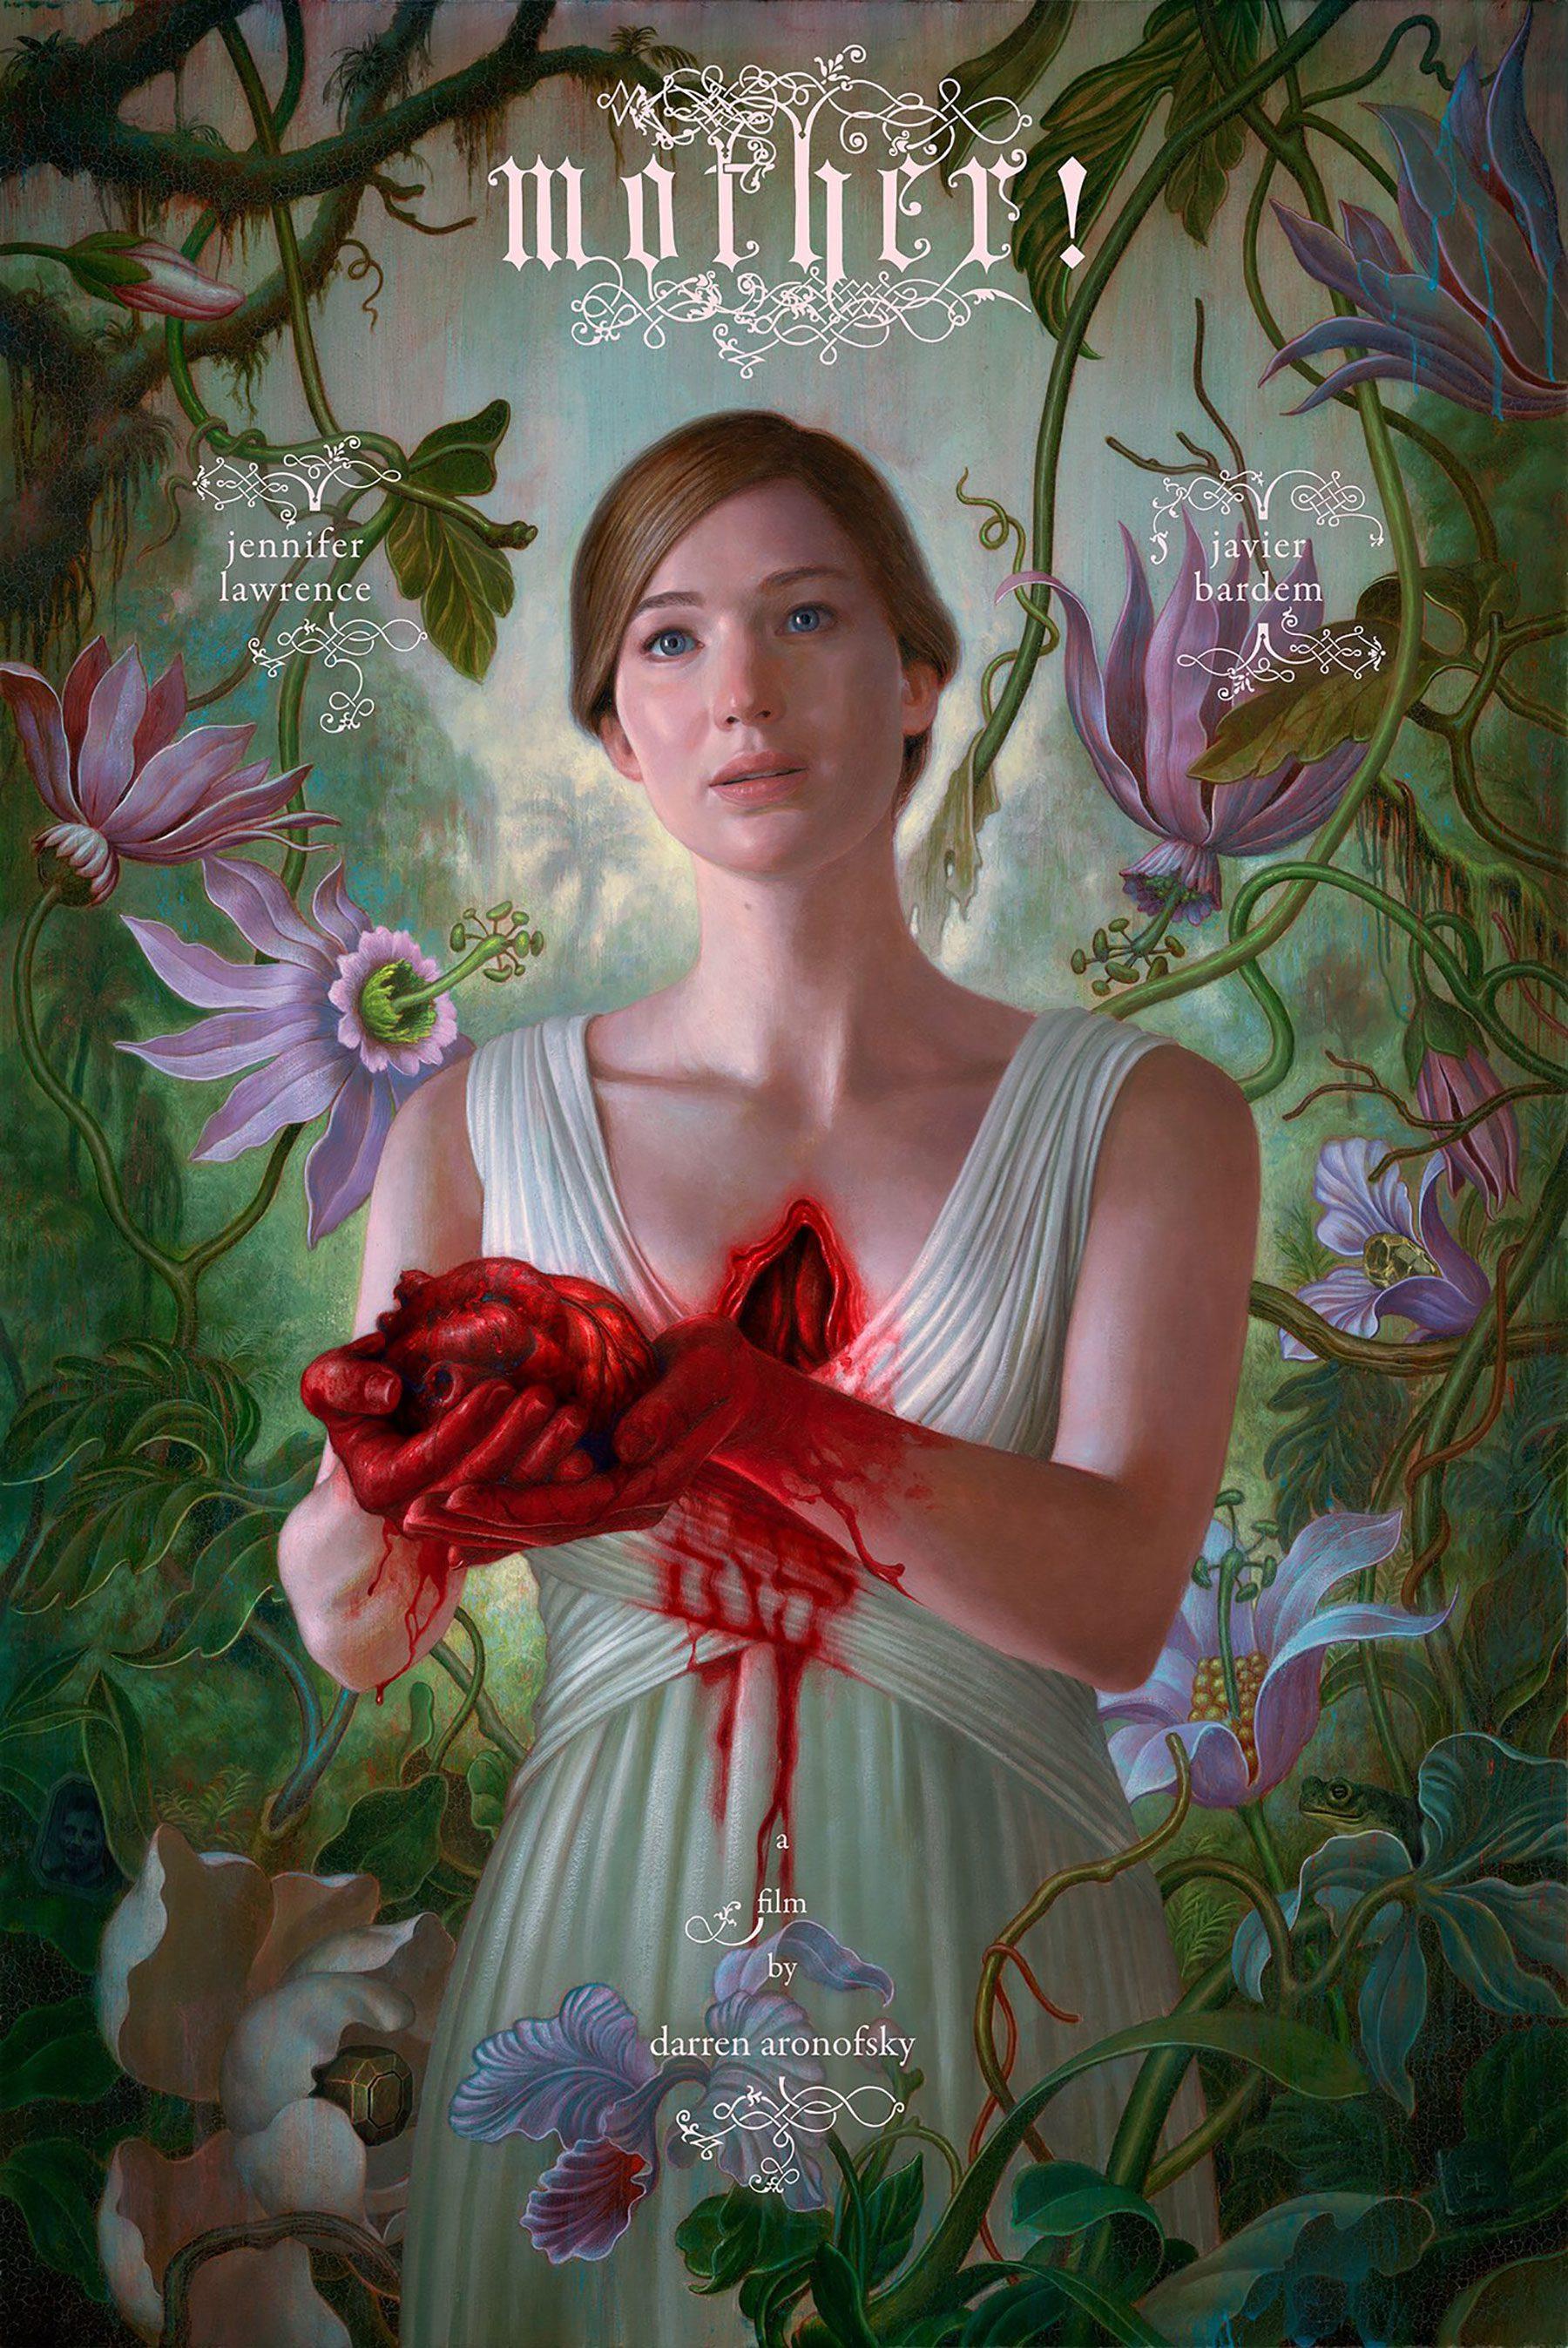 Primer avance de 'Madre!', la nueva película de Darren Aronofsky con Jennifer Lawrence • En tu pantalla